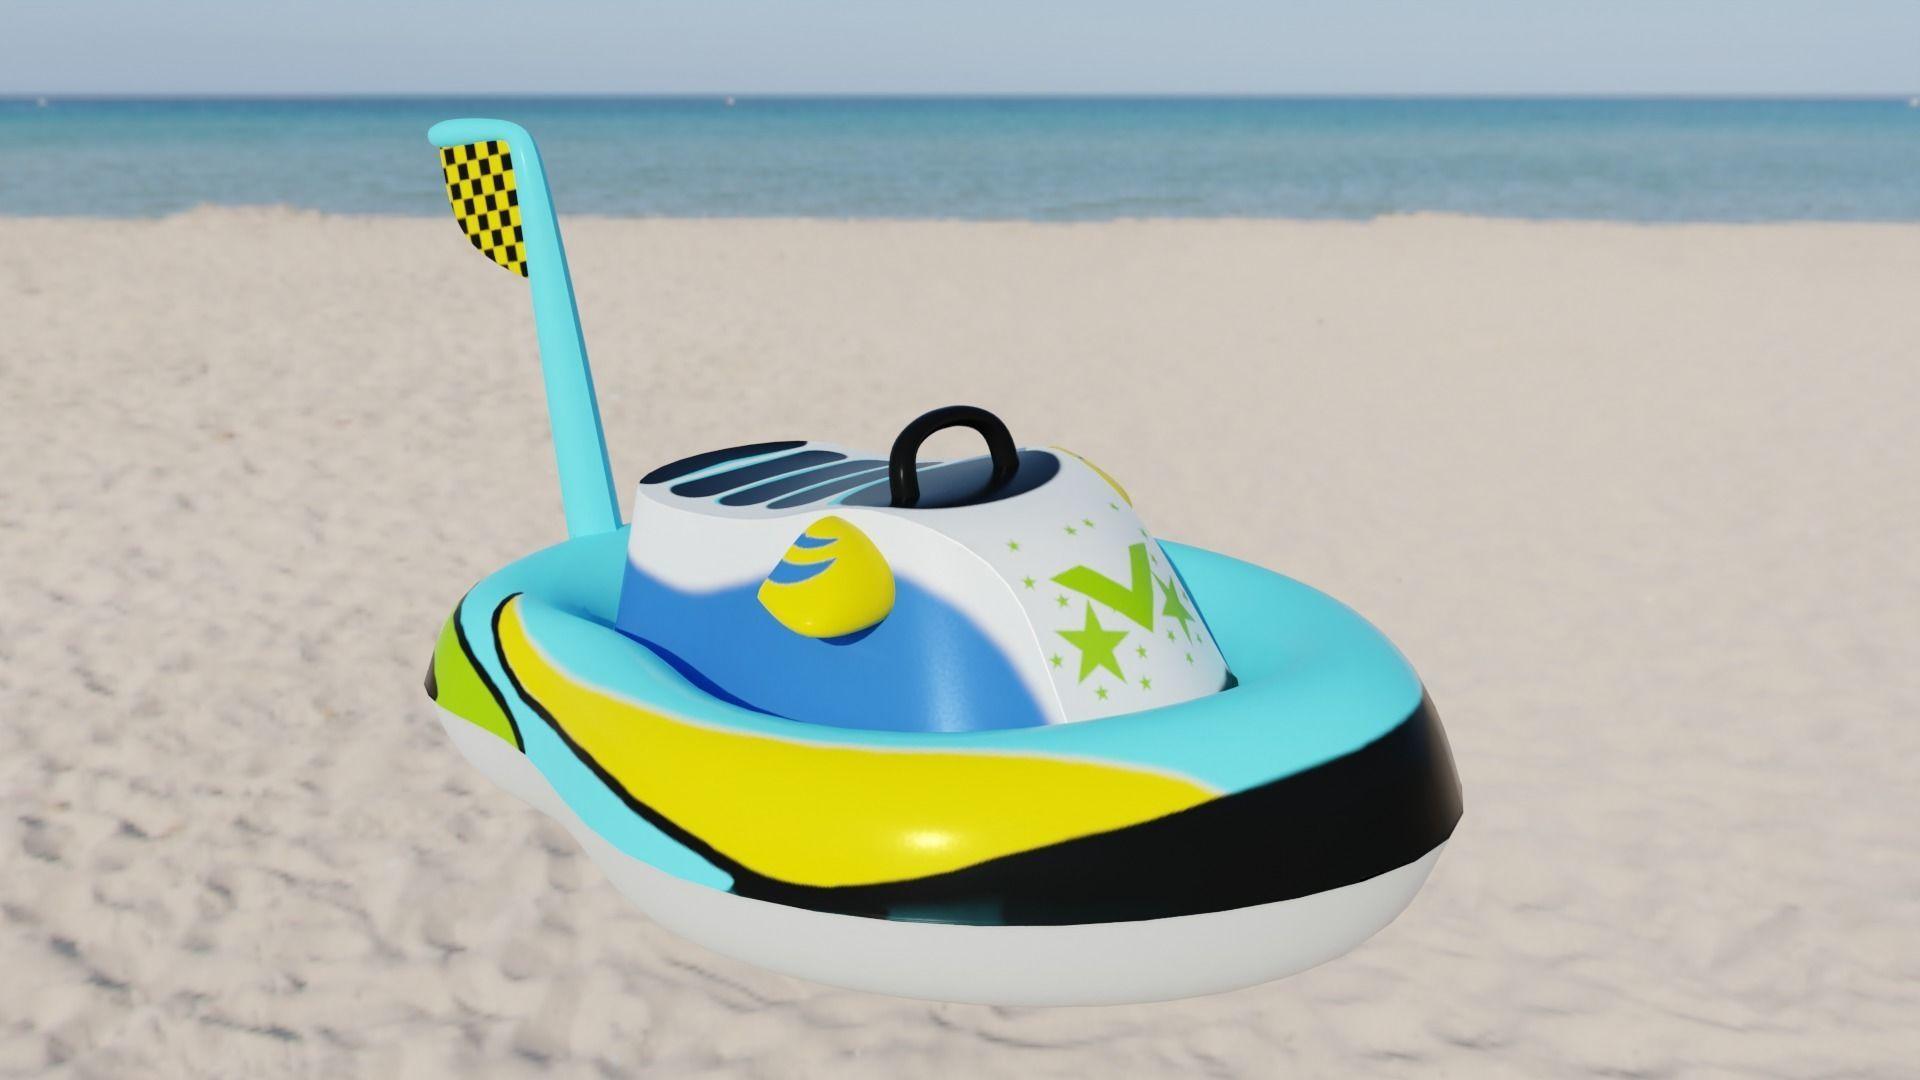 Jet Ski Inflatable Toy